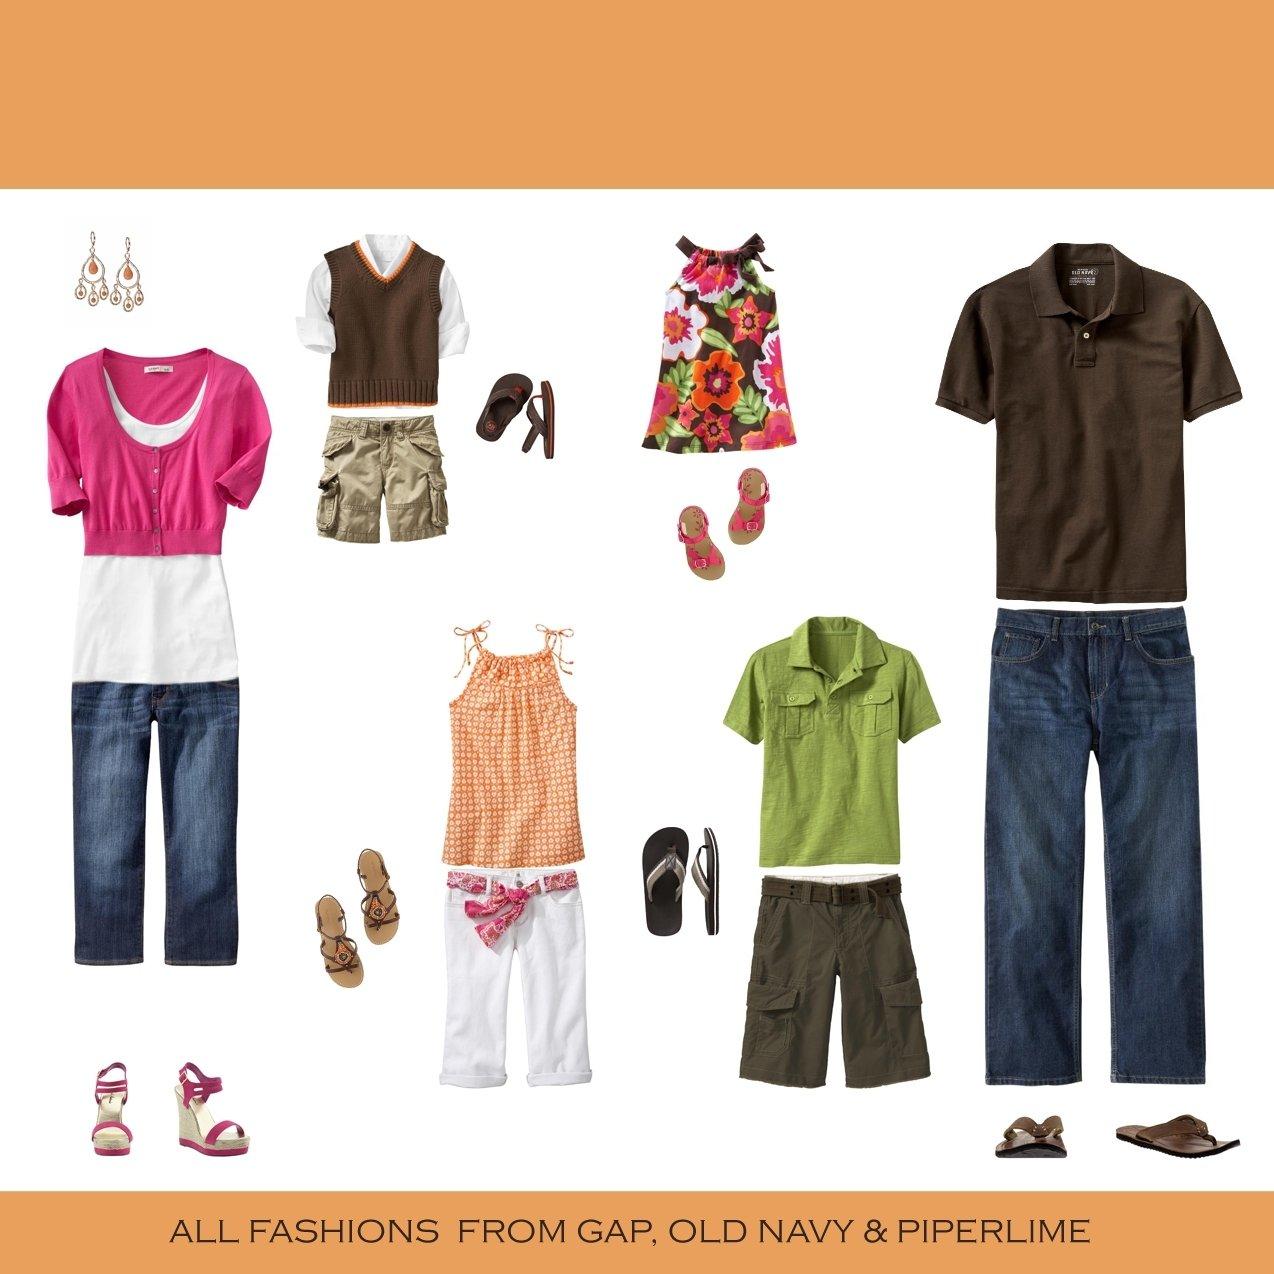 10 Cute Summer Family Photo Clothing Ideas summer family photo clothing ideas beach photography clothing ideas 2020